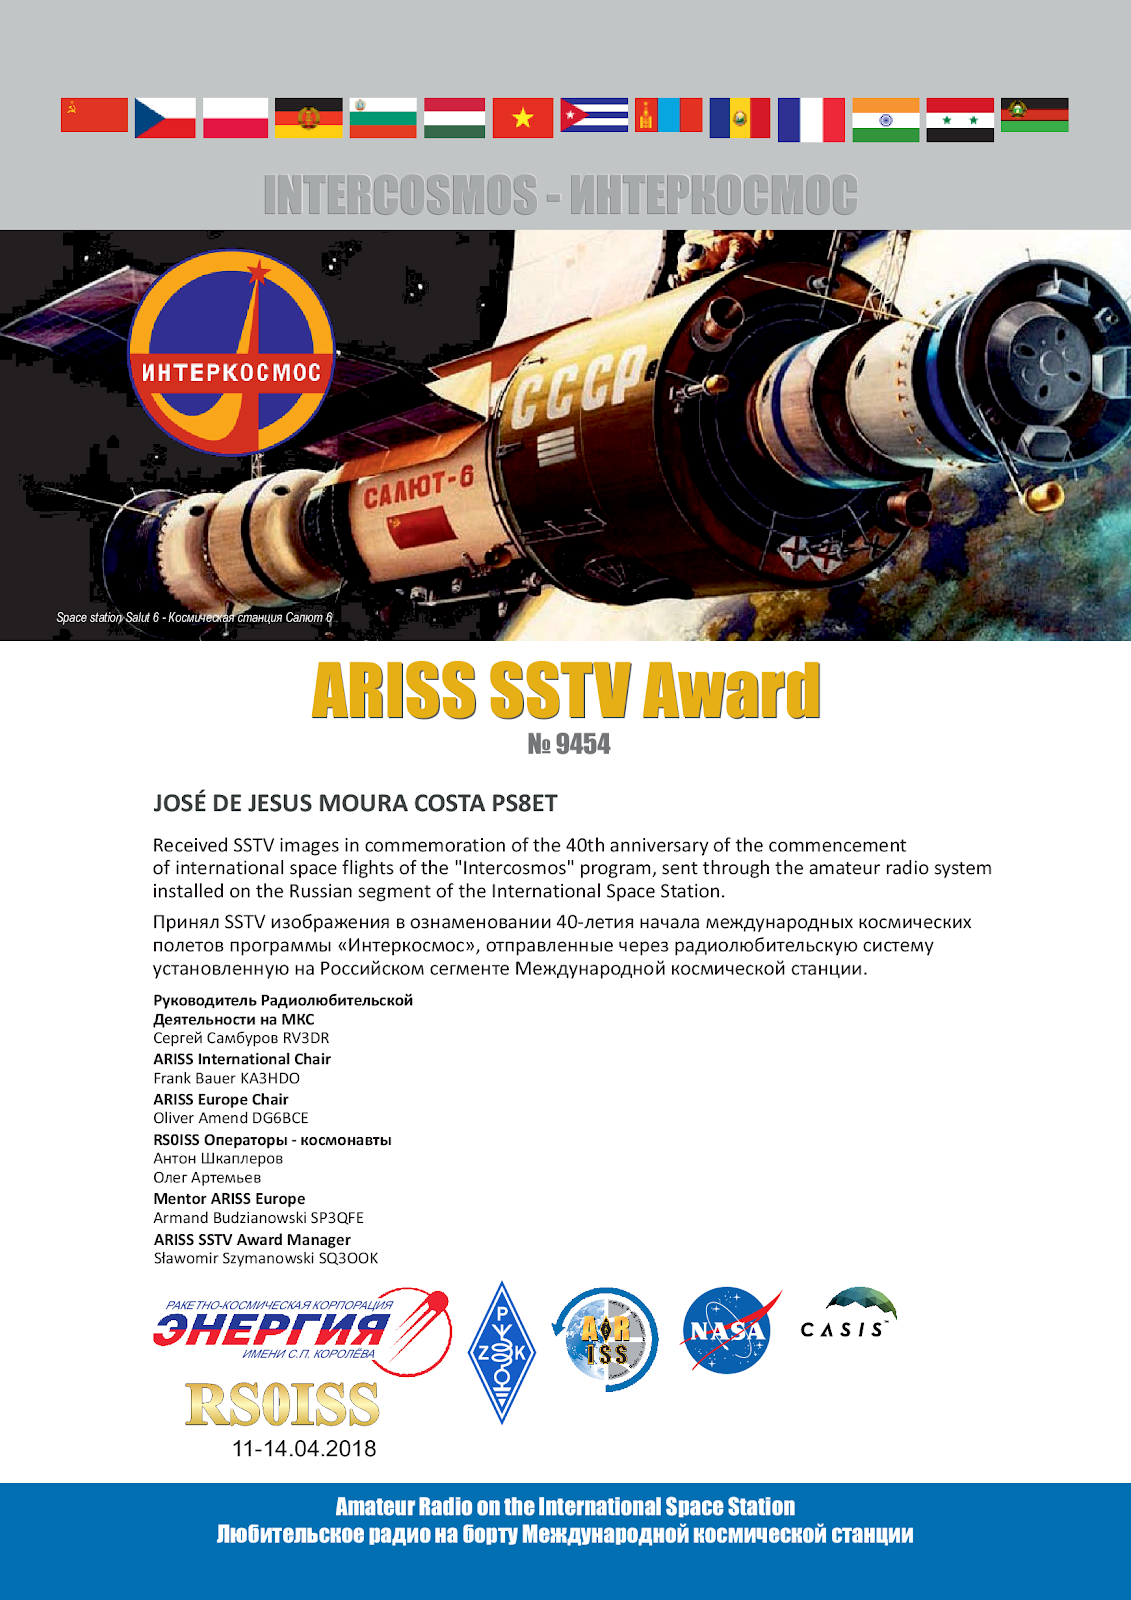 RS0ISS - ARISS SSTV Award - 2018